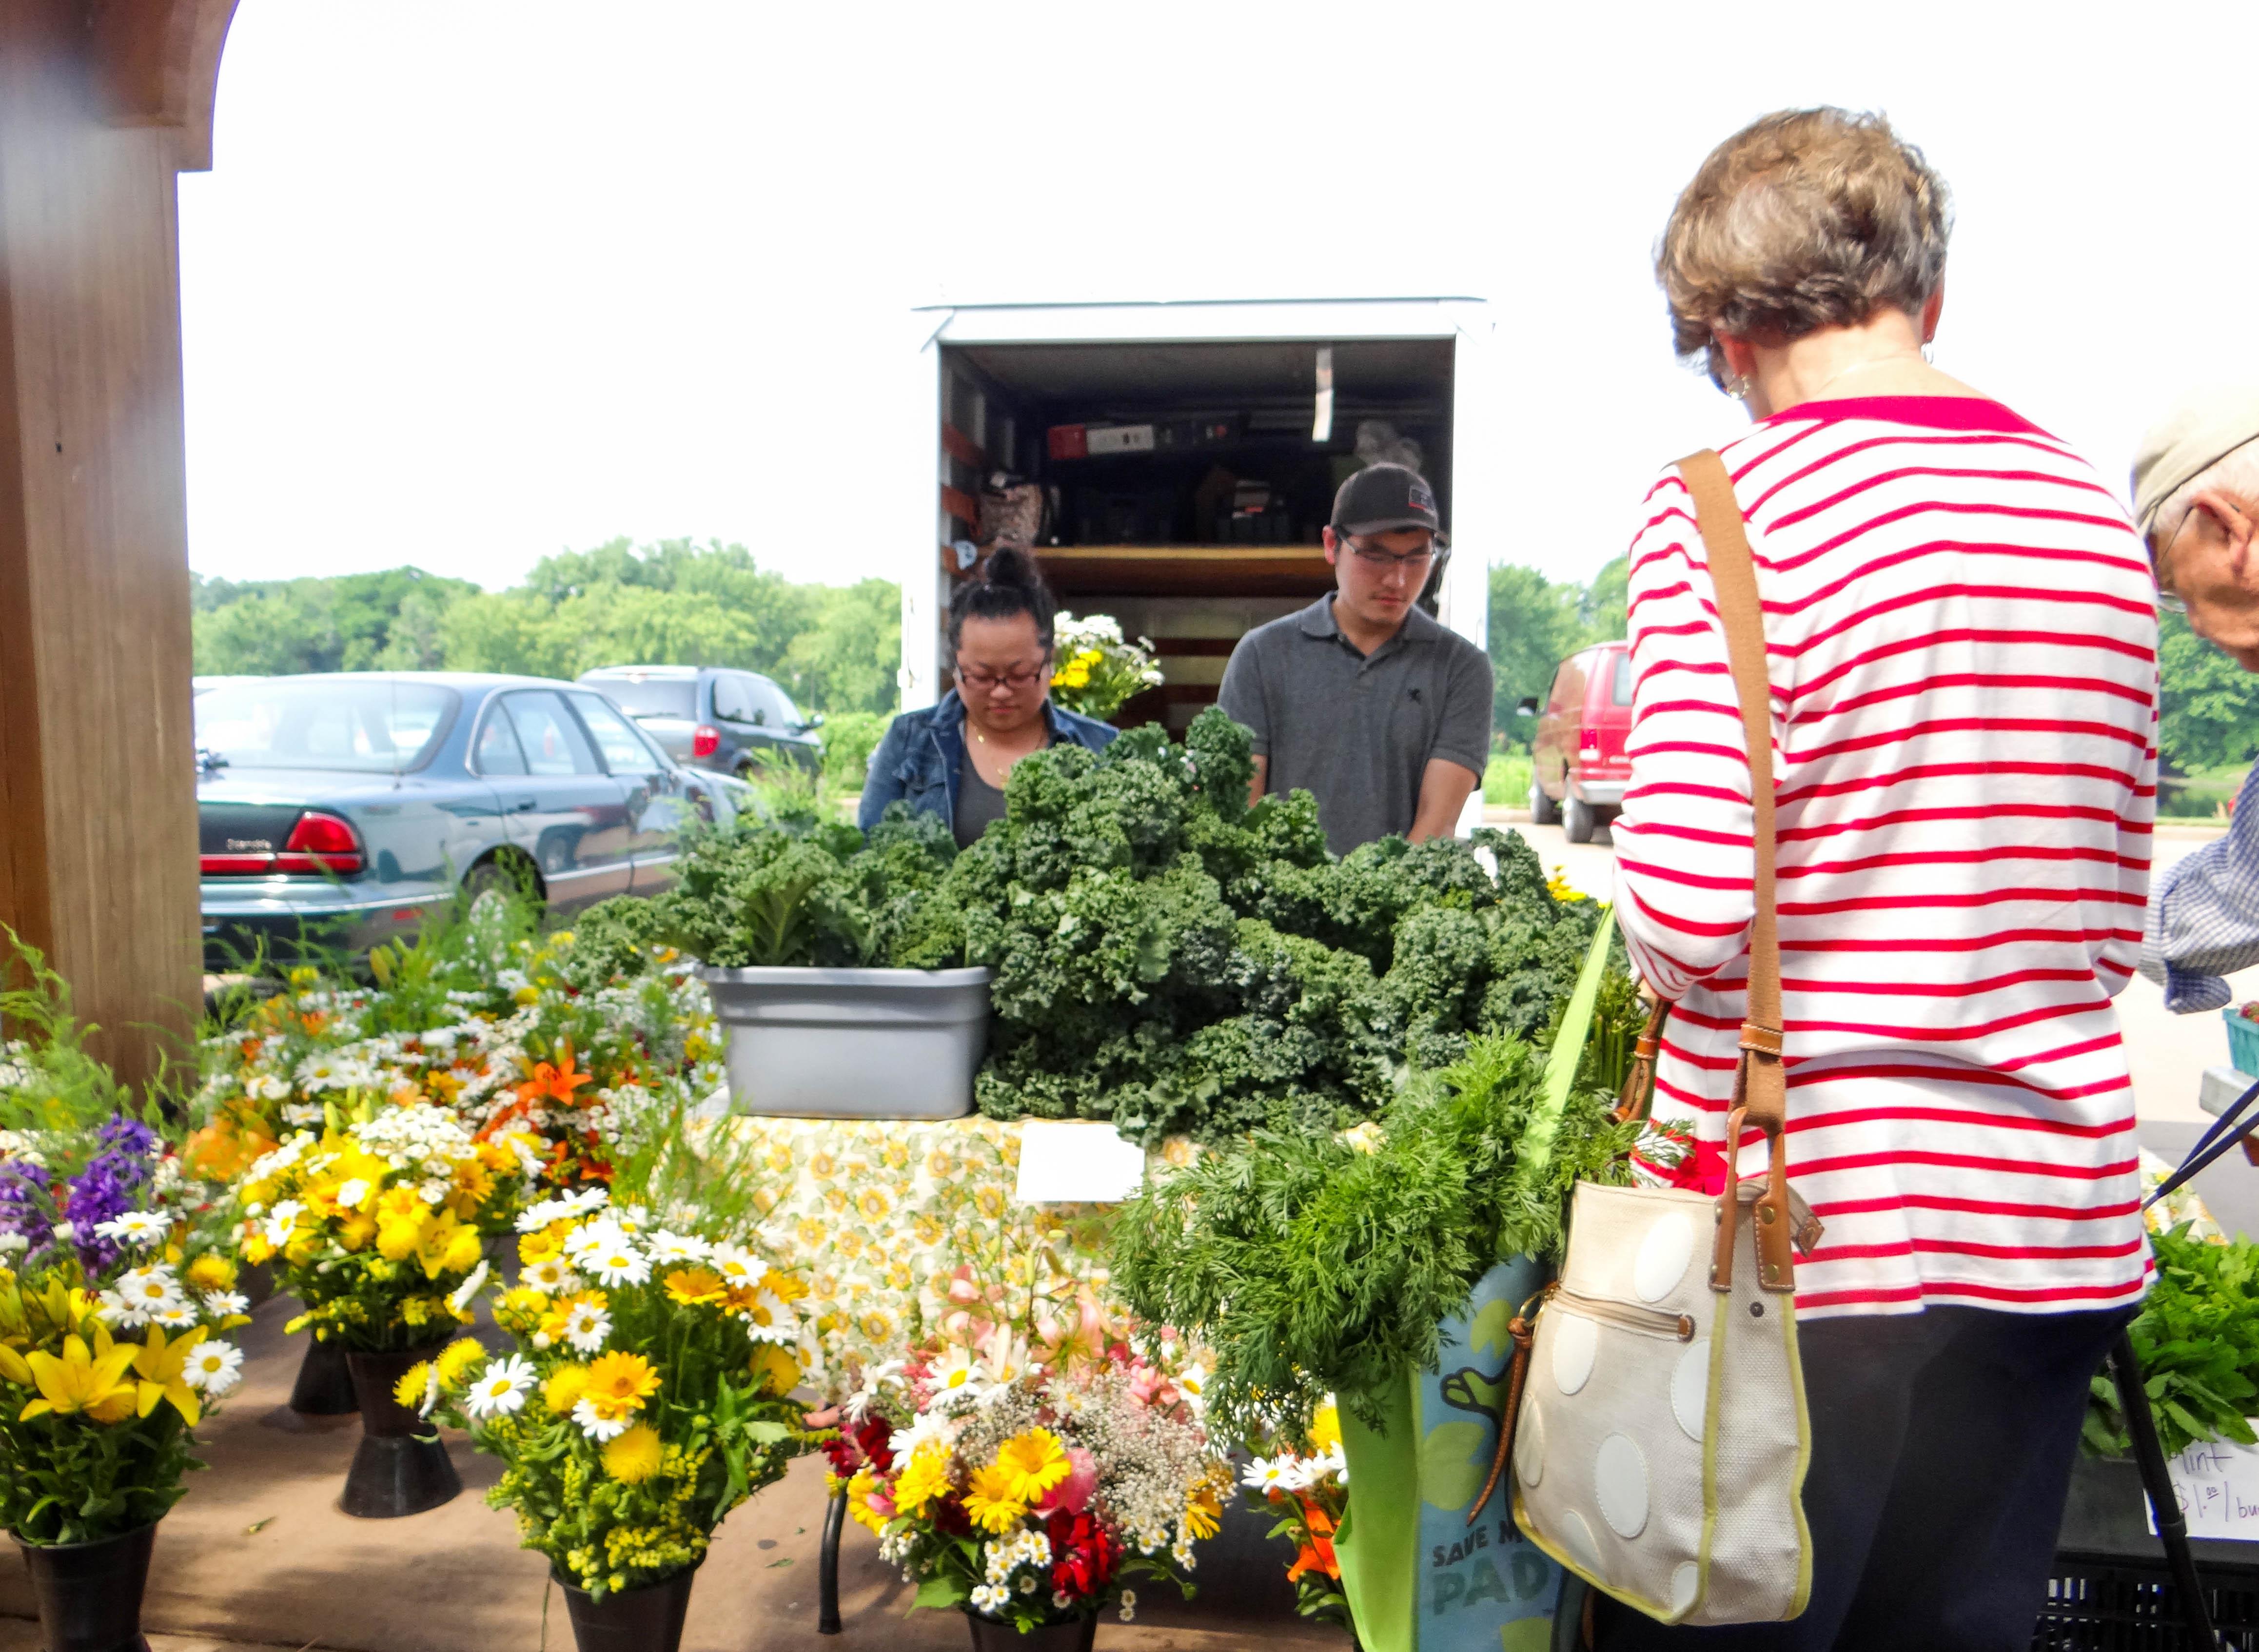 Farmer's Market in Downtown Eau Claire, Wisconsin